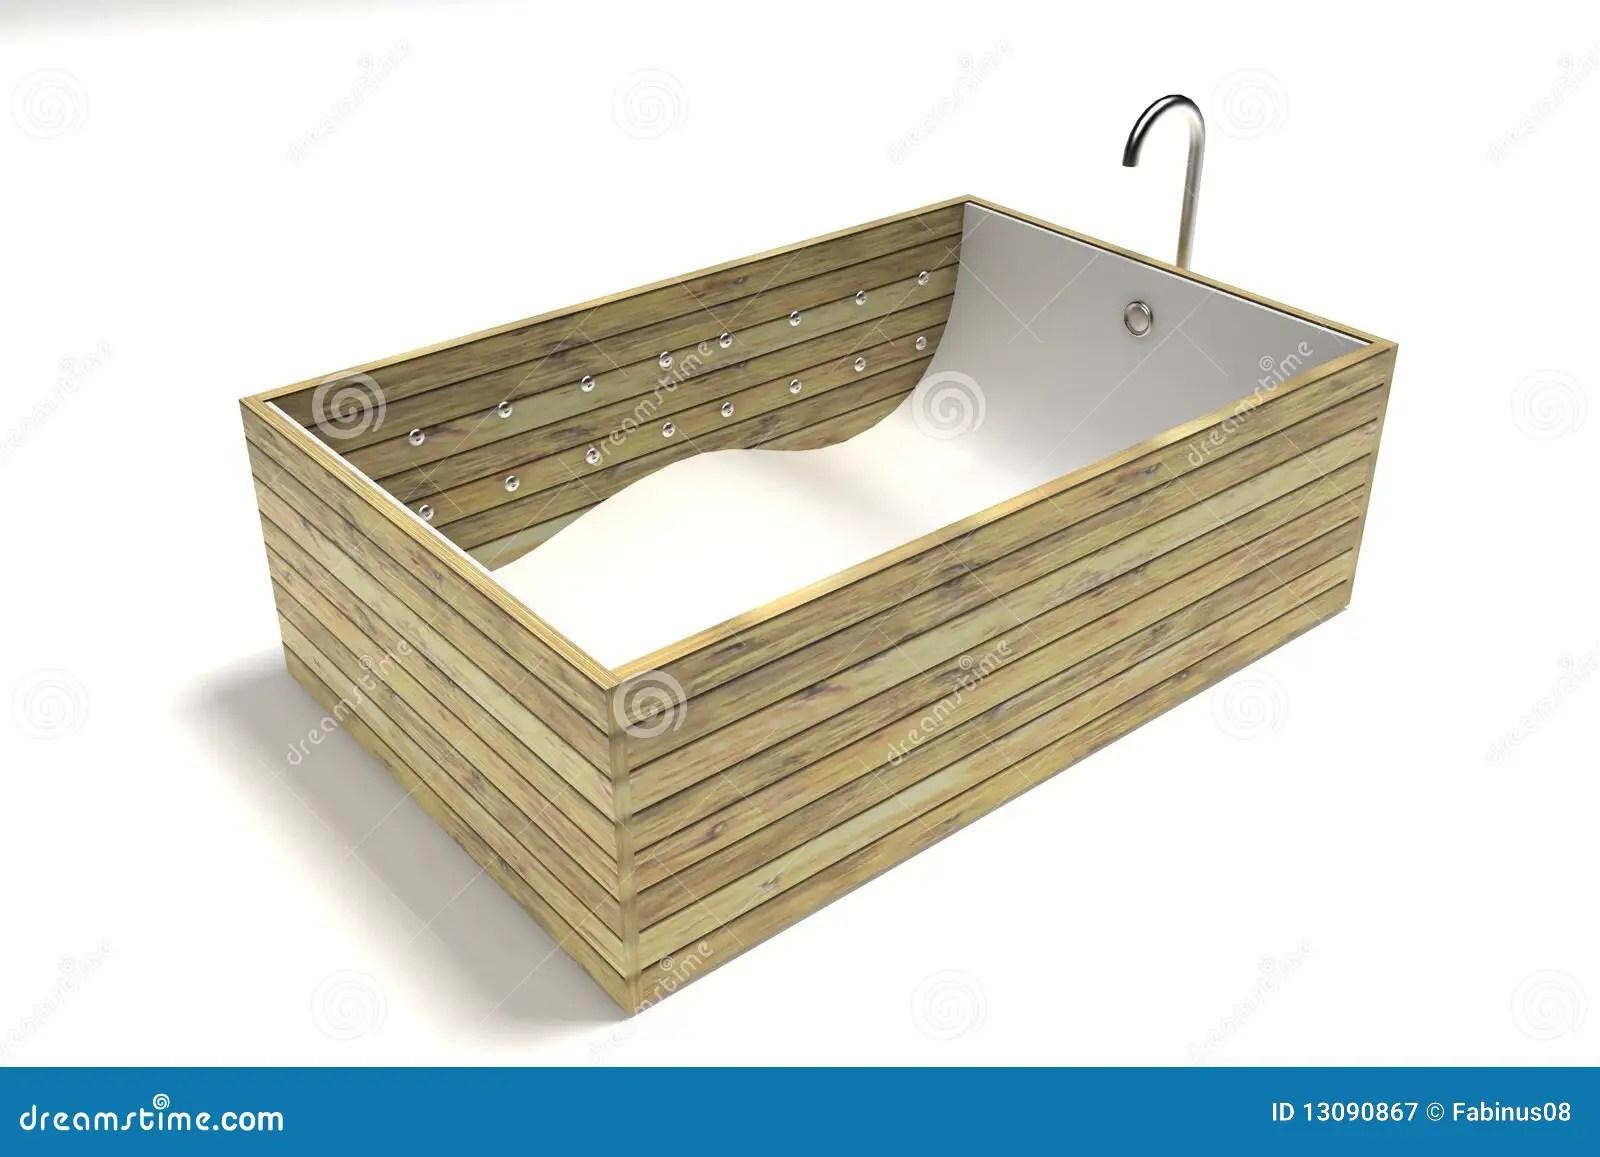 Vasca Da Bagno Legno : Vasche da bagno legno bella vasca da bagno in legno fai da te